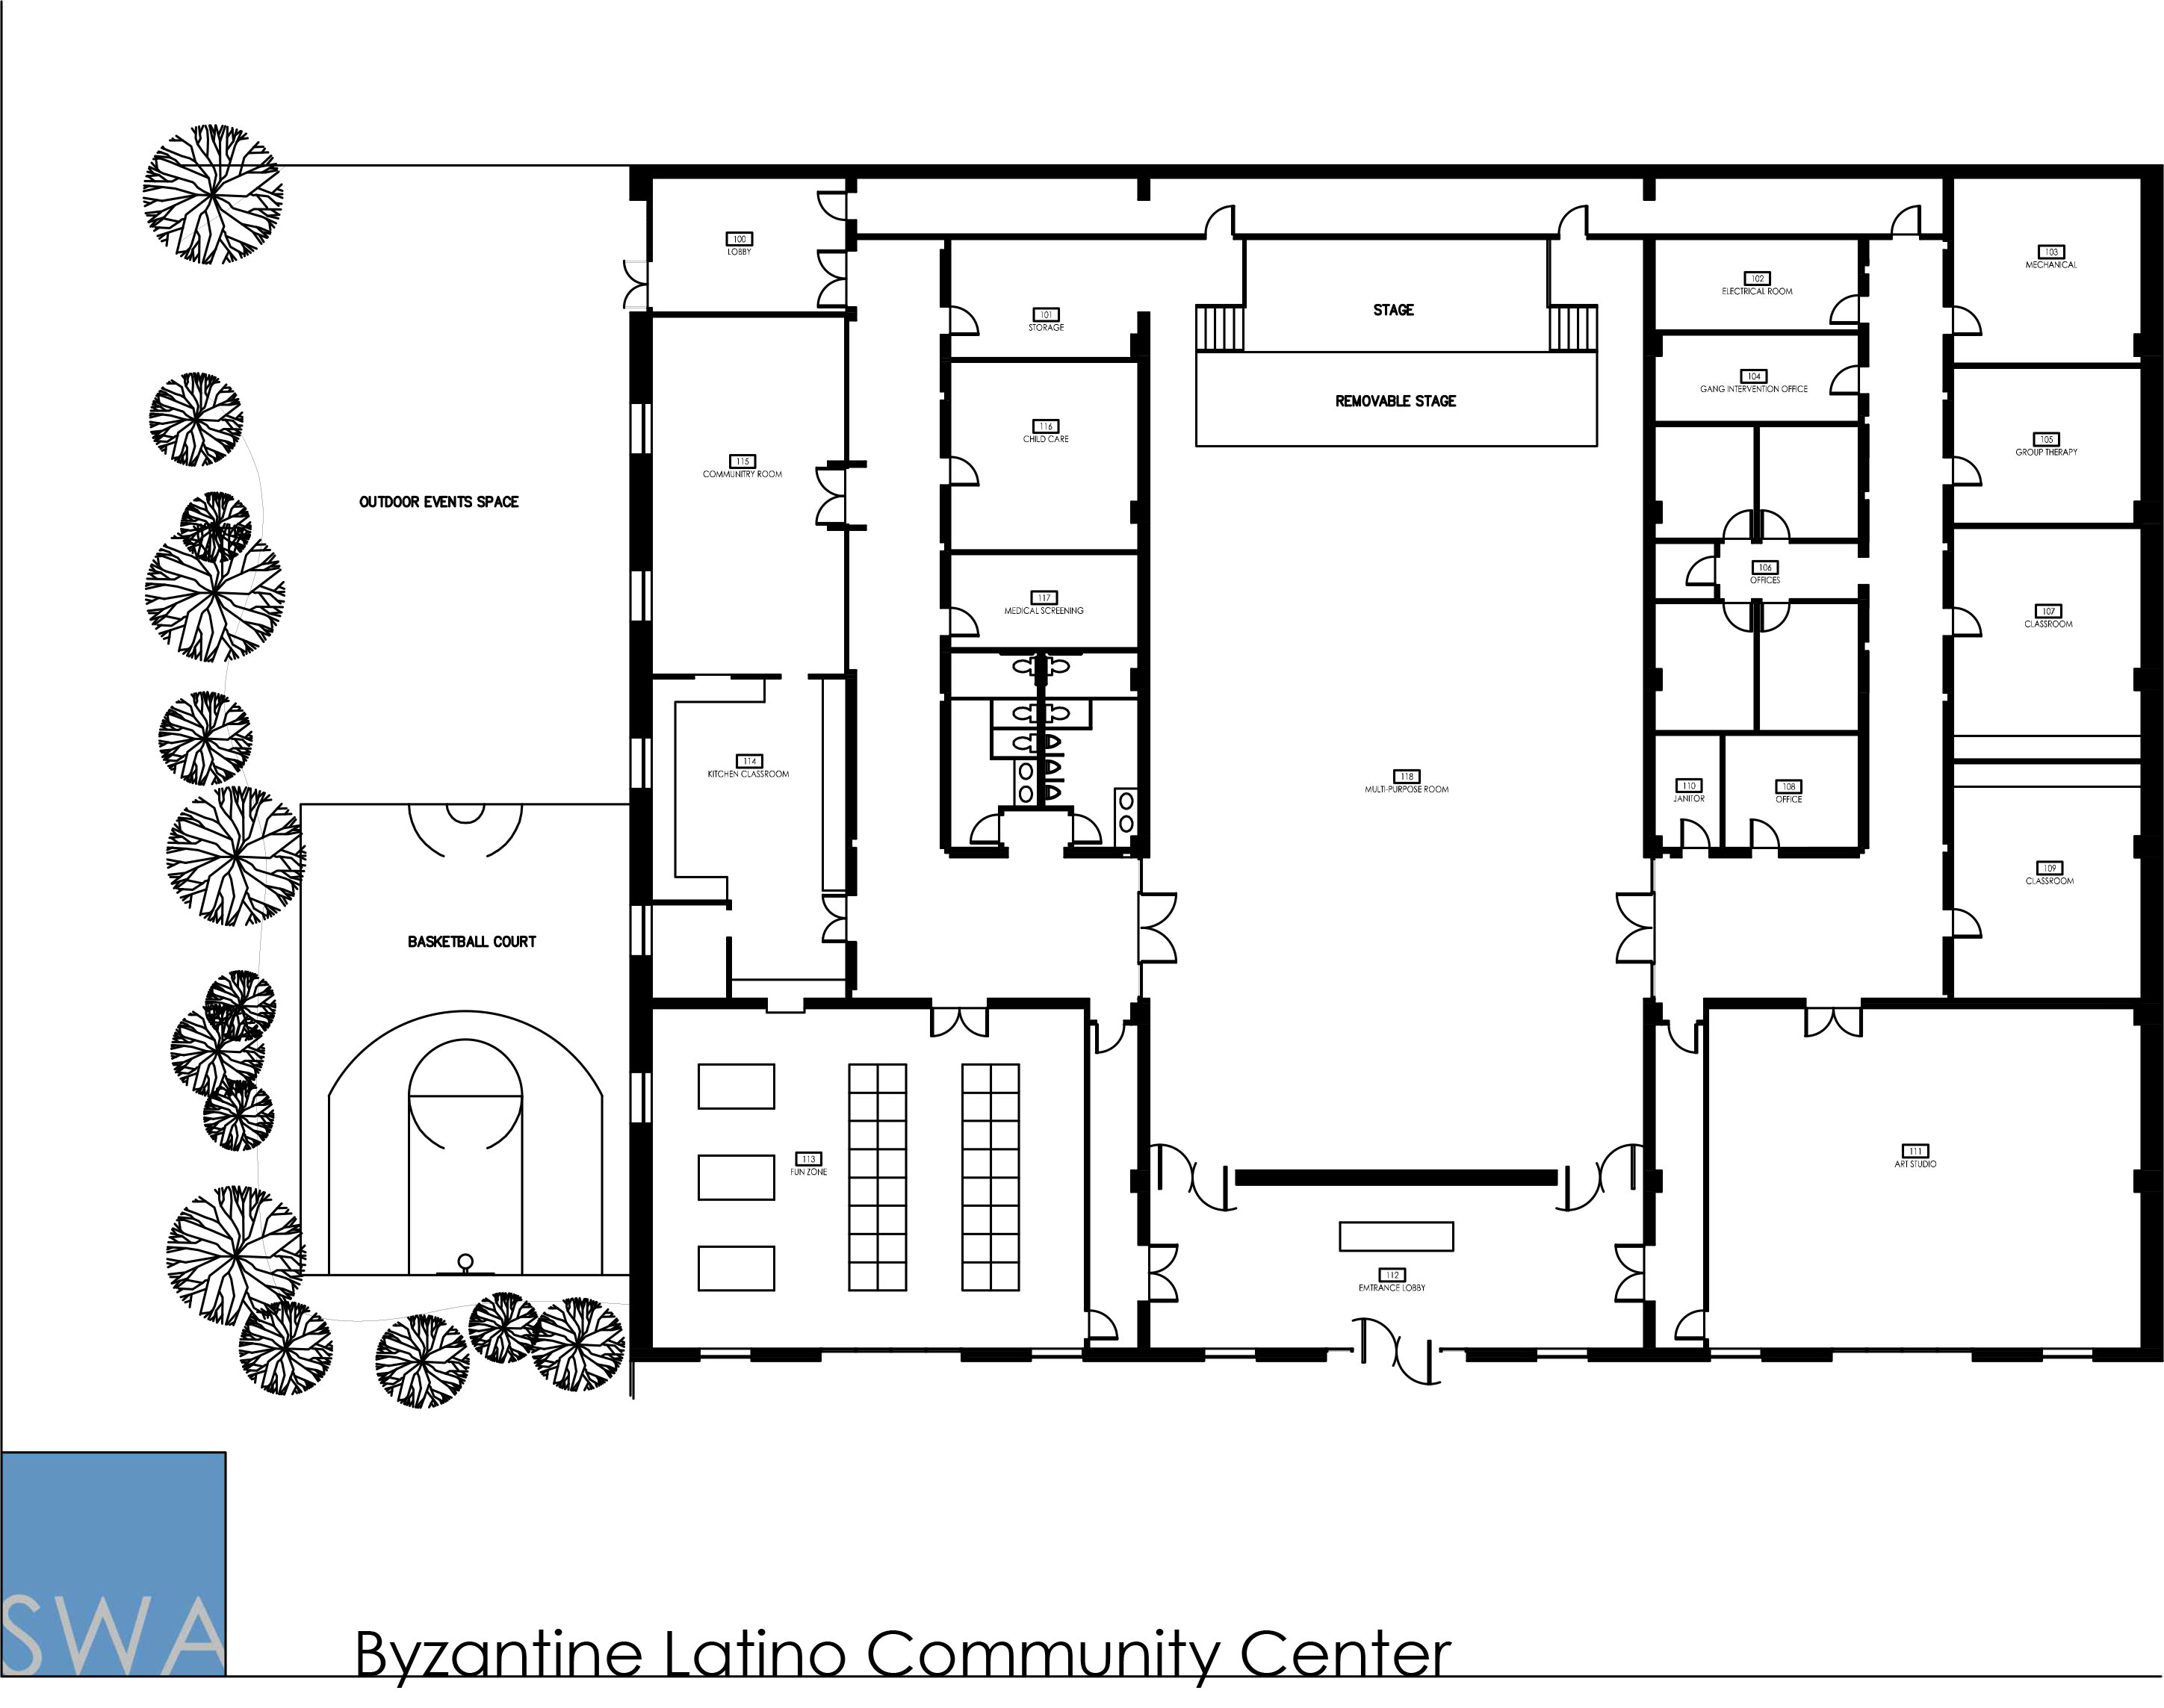 Byzantine Latino Community Center